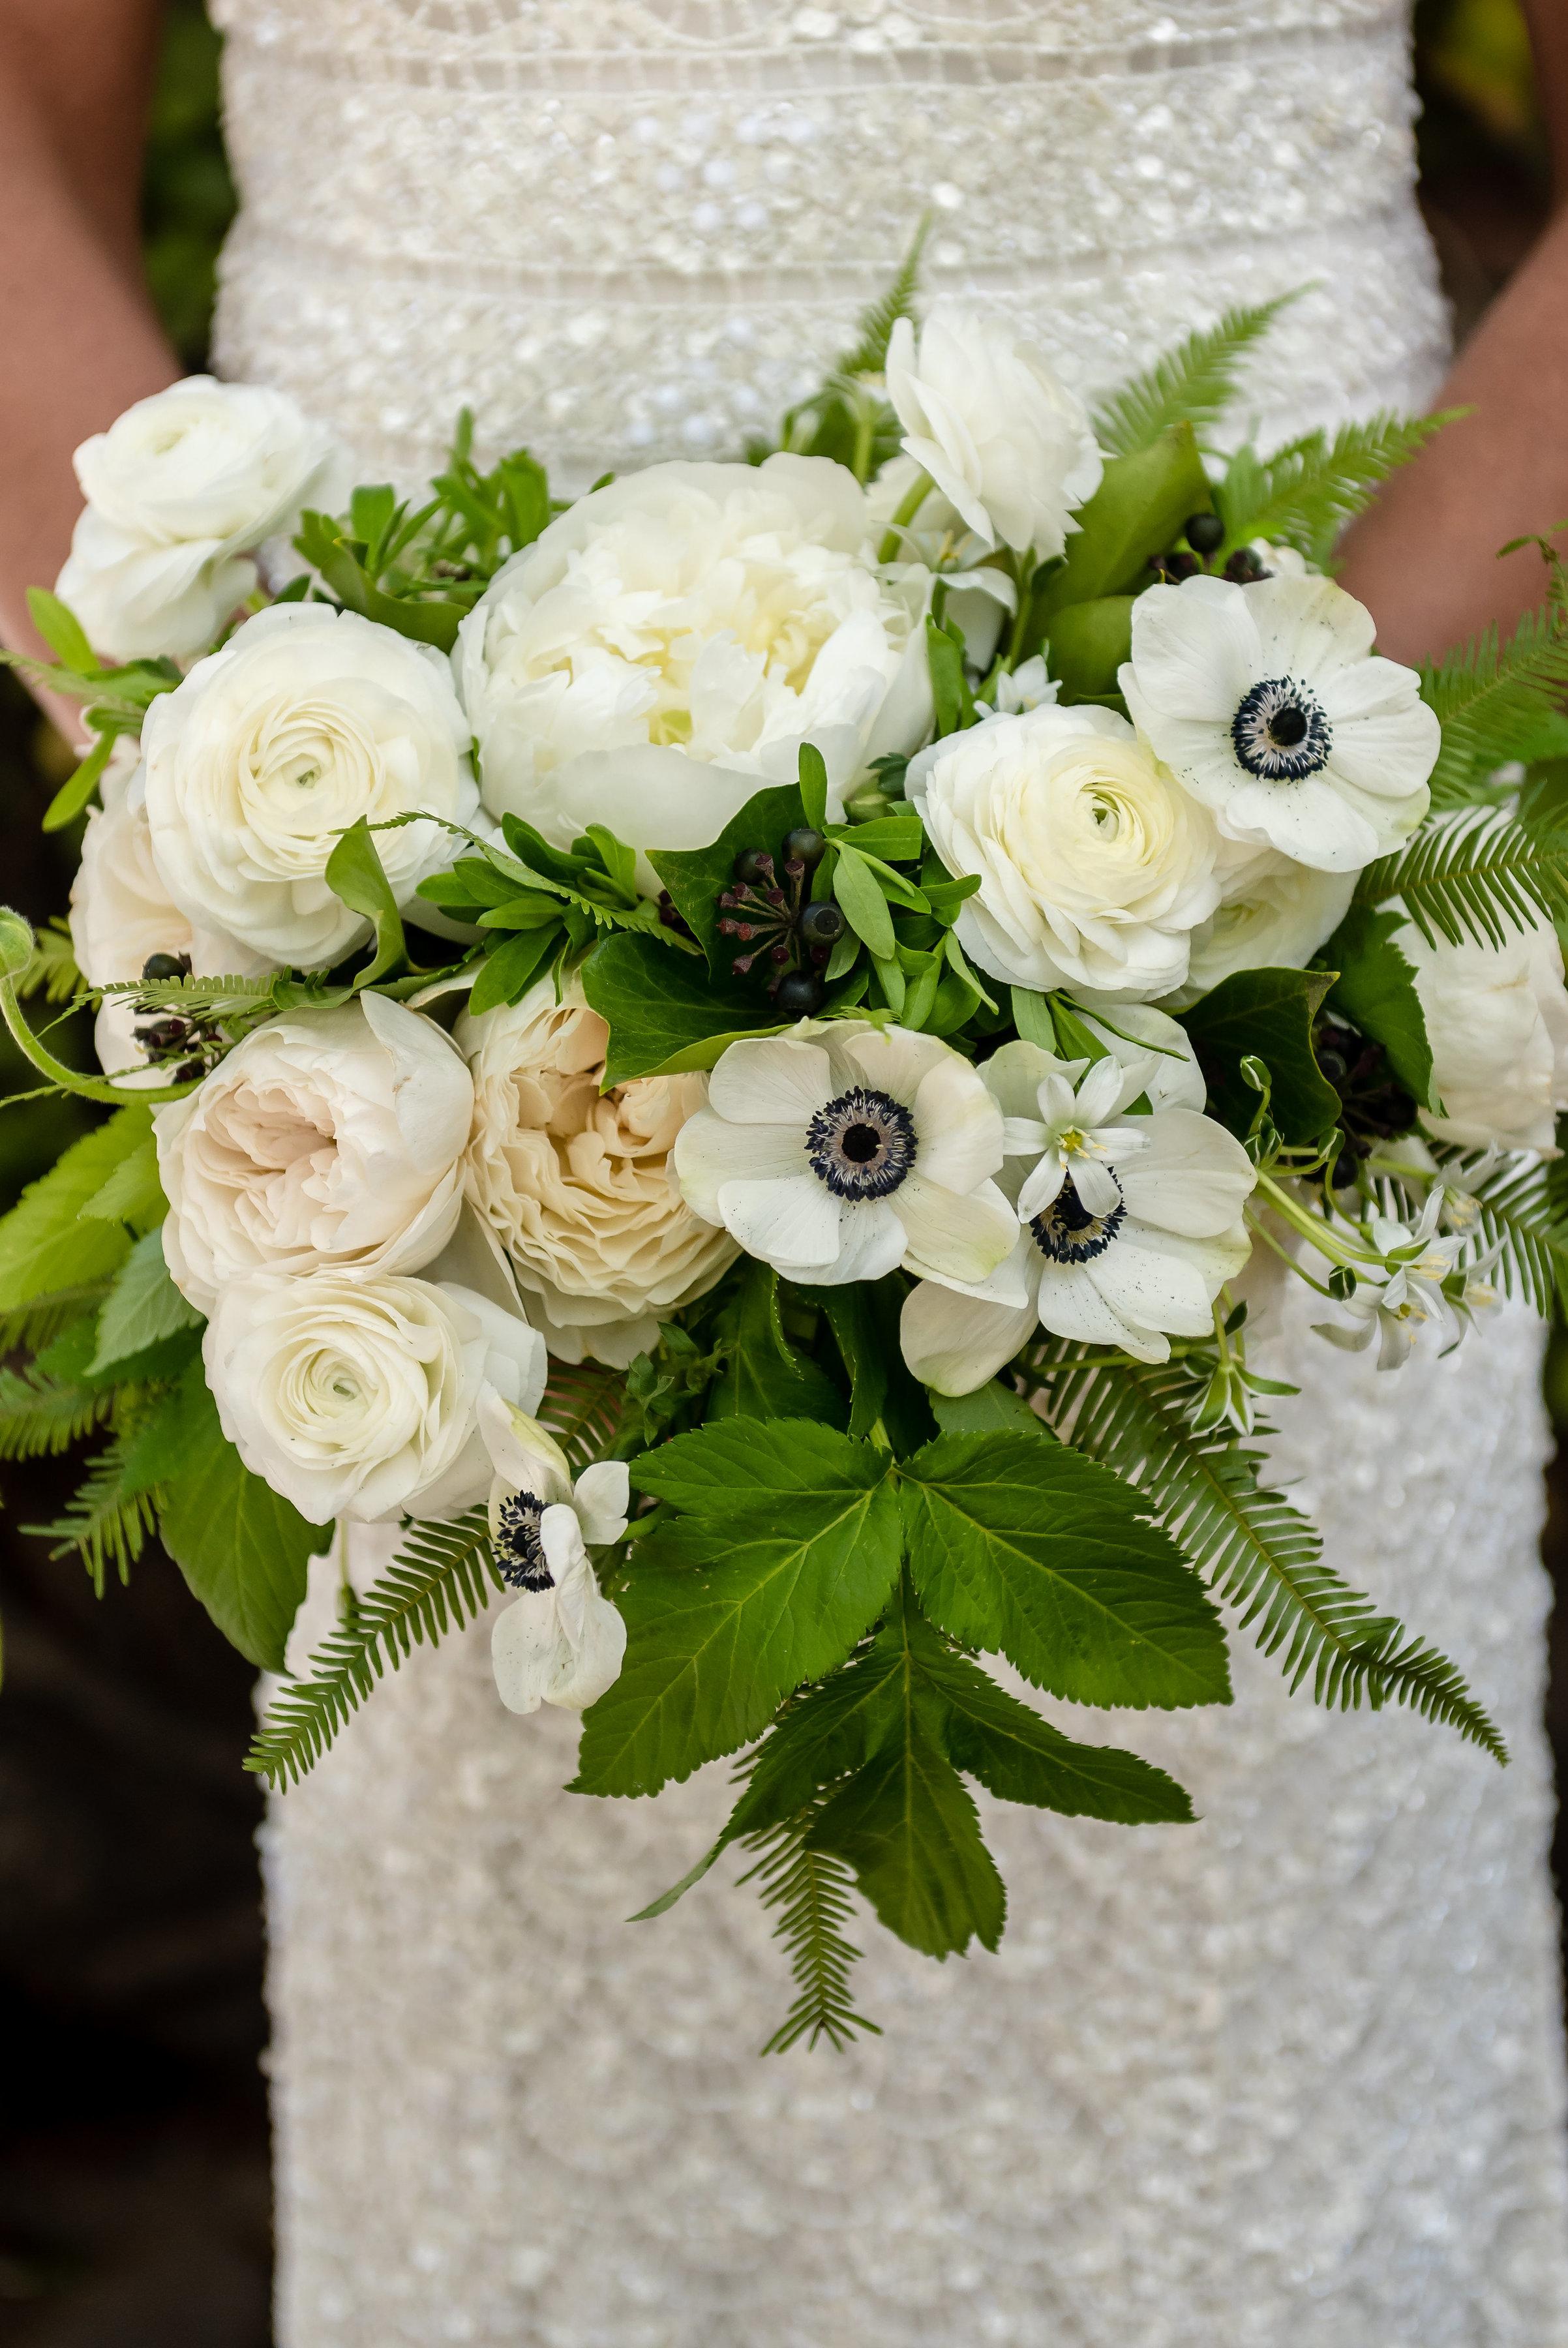 Green and White Wedding Bouquet.jpg